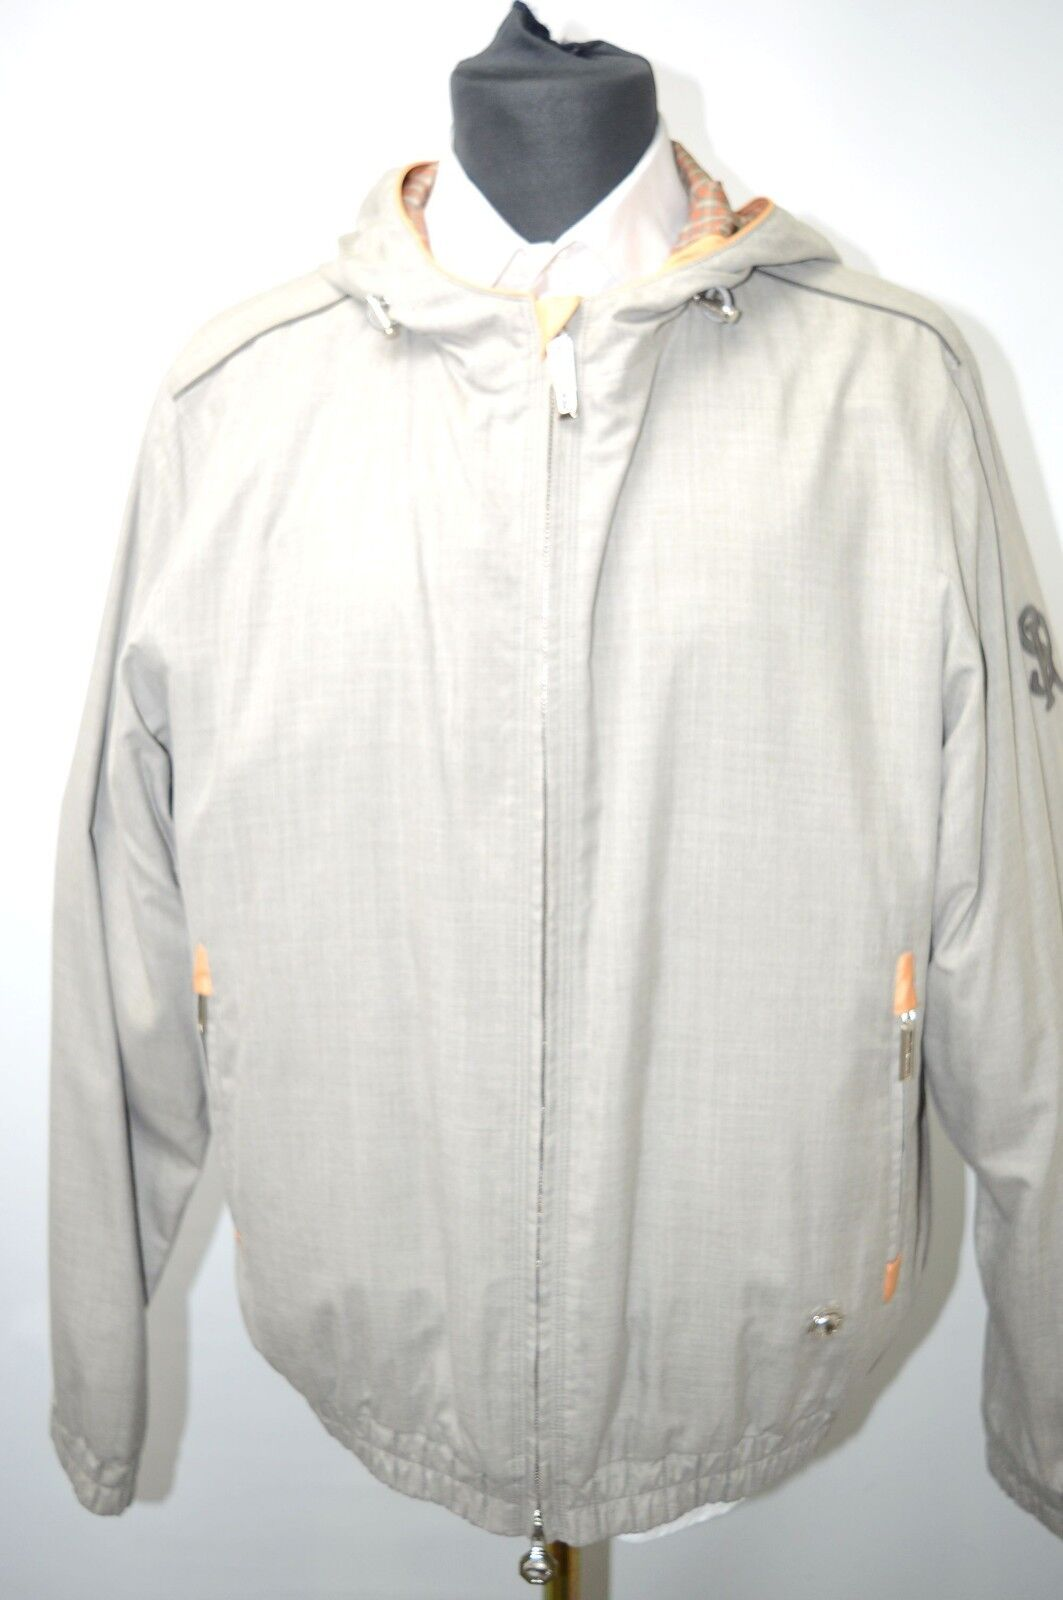 NEW 8550,00  STEFANO RICCI Outwear  Coat Silk  Us 2XL Eu 56 G107